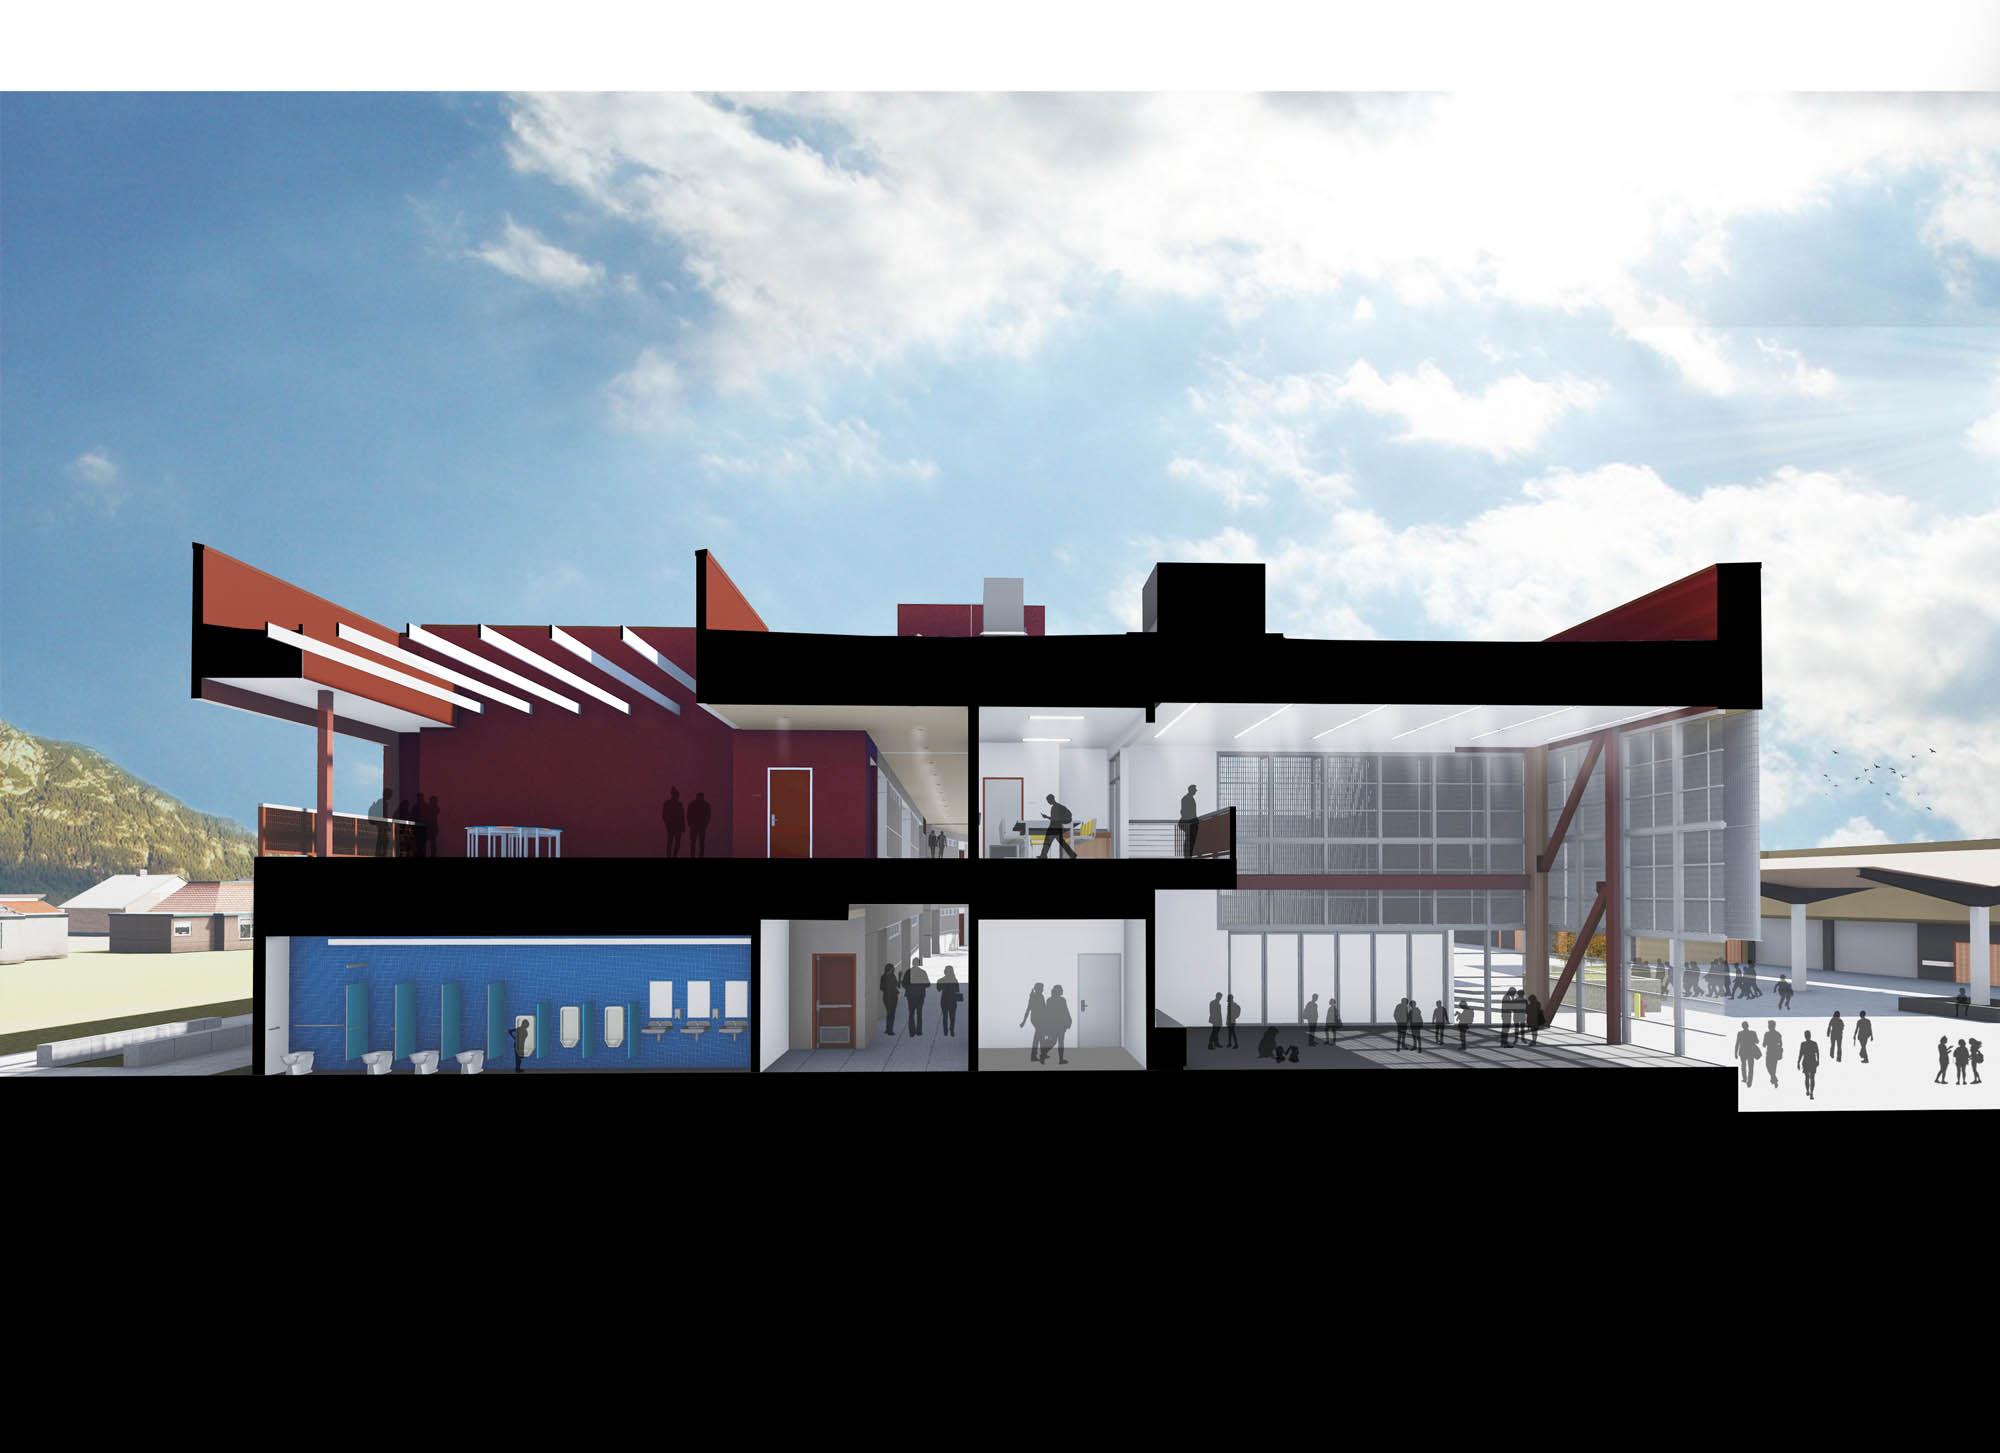 RCMS_Building_C02.jpg